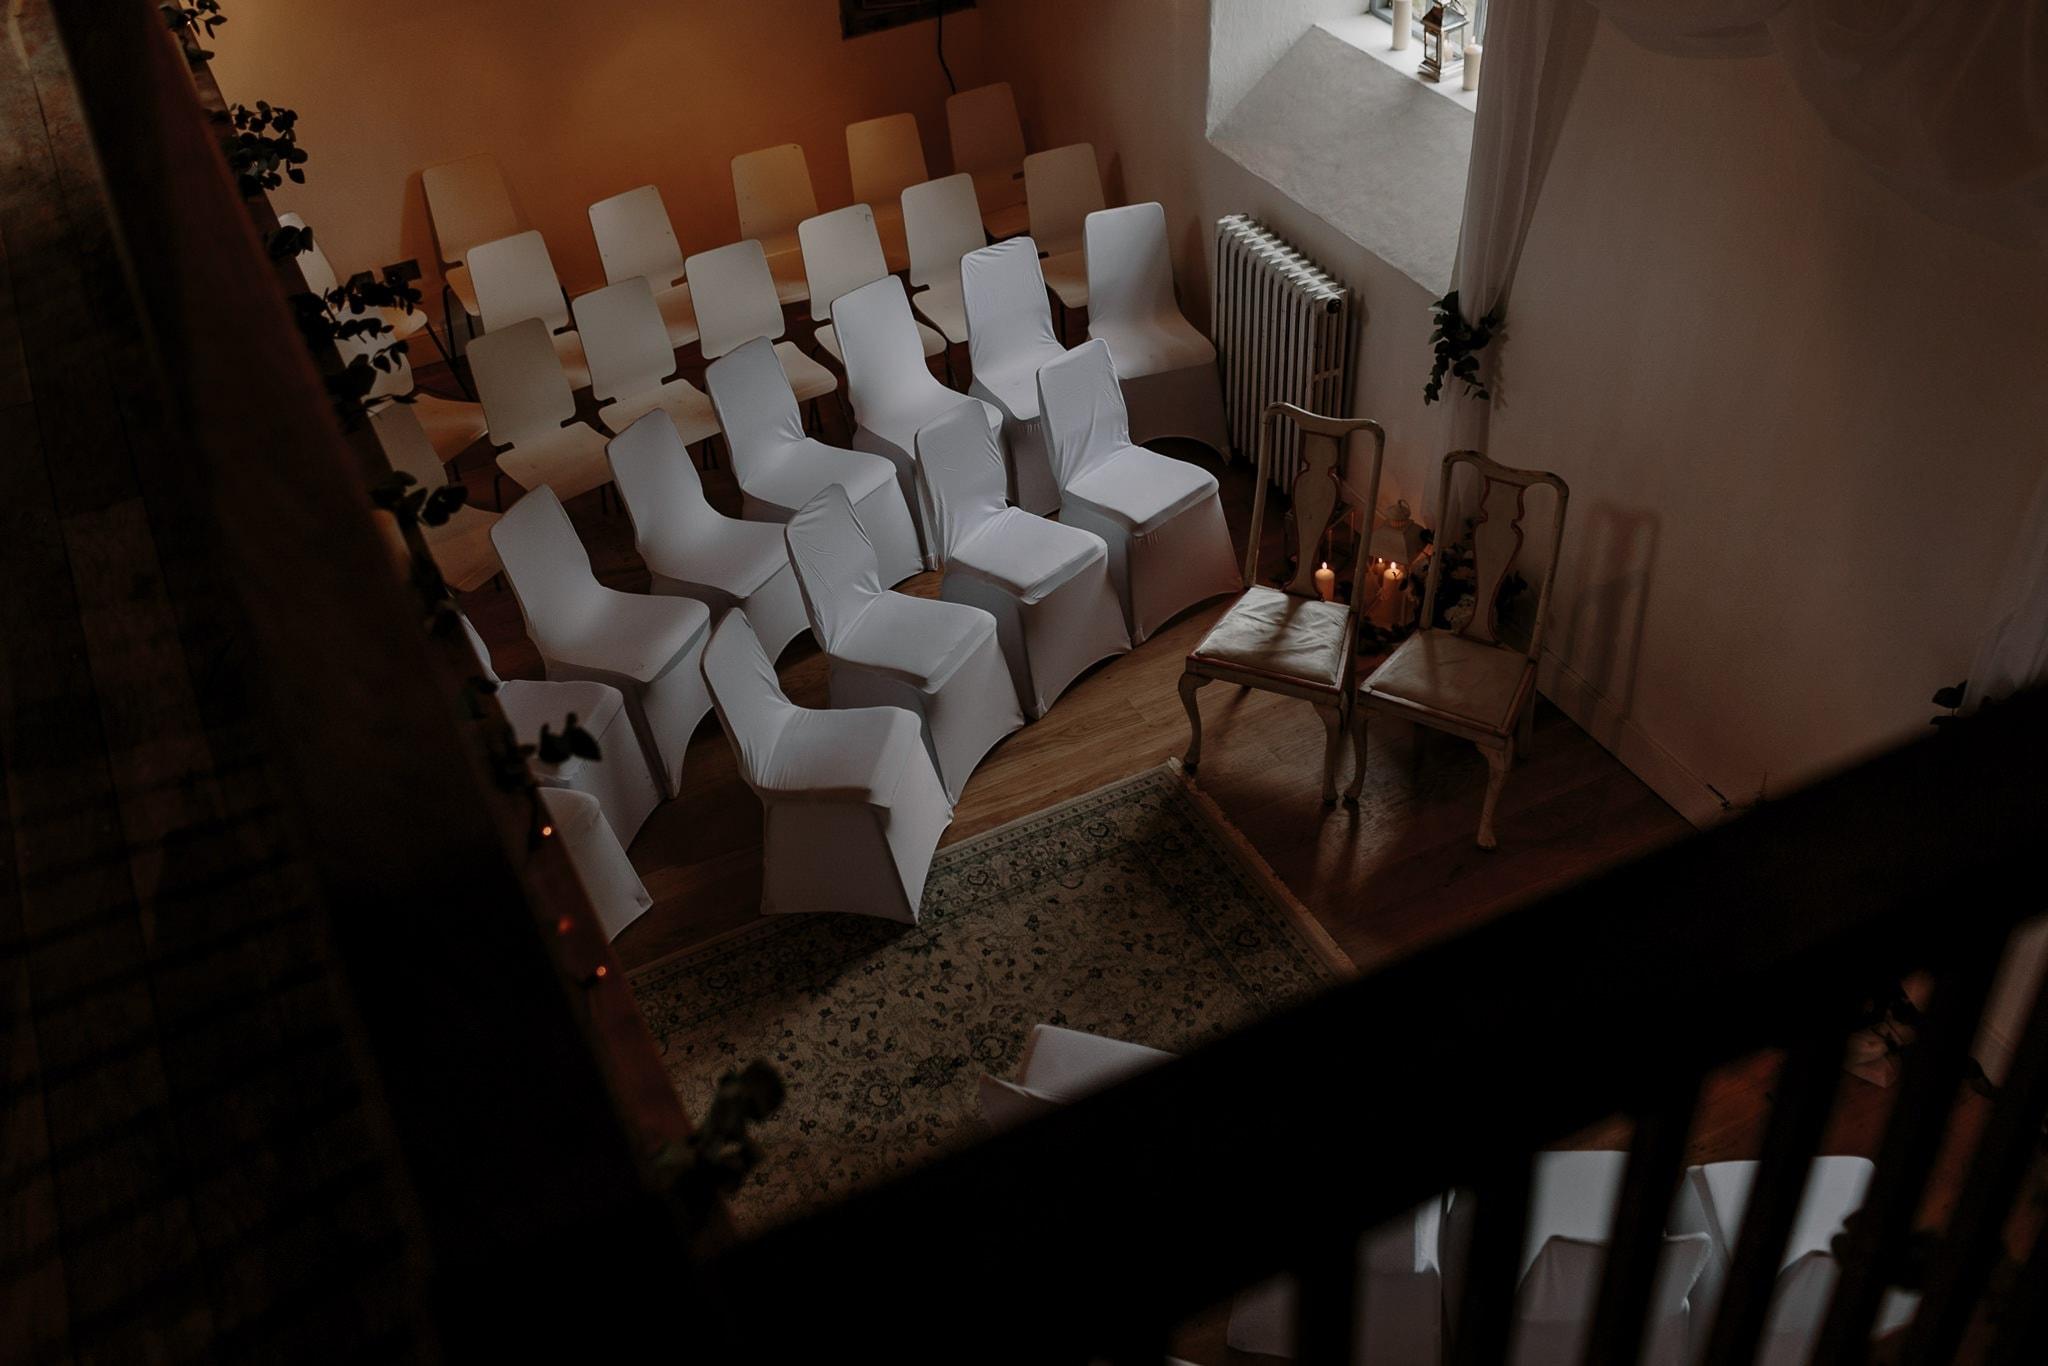 Carreglwyd Ceremony Room